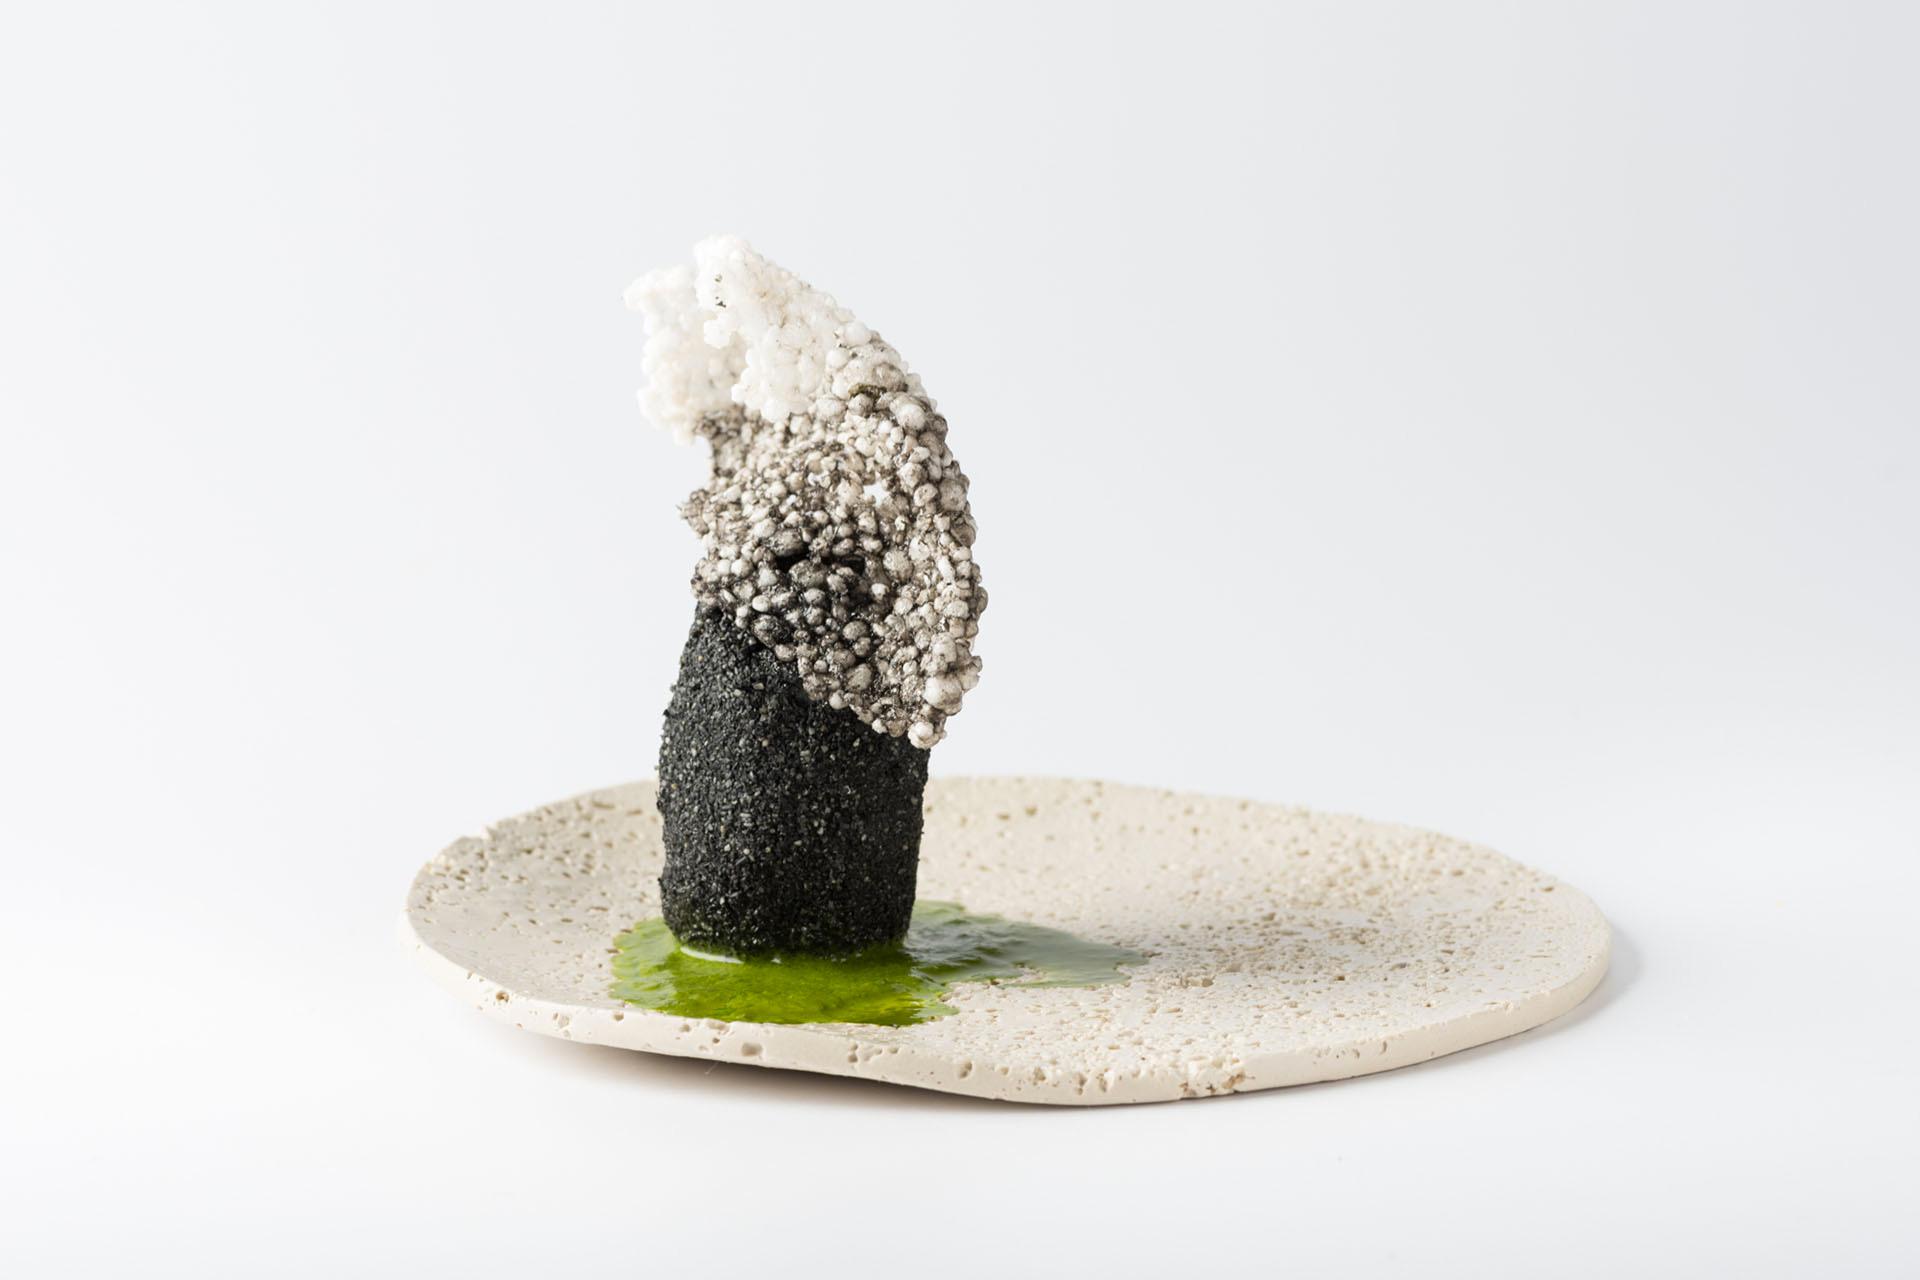 ecole_design_culinaire_master_food_digestion_ceramics_potatoe_dish